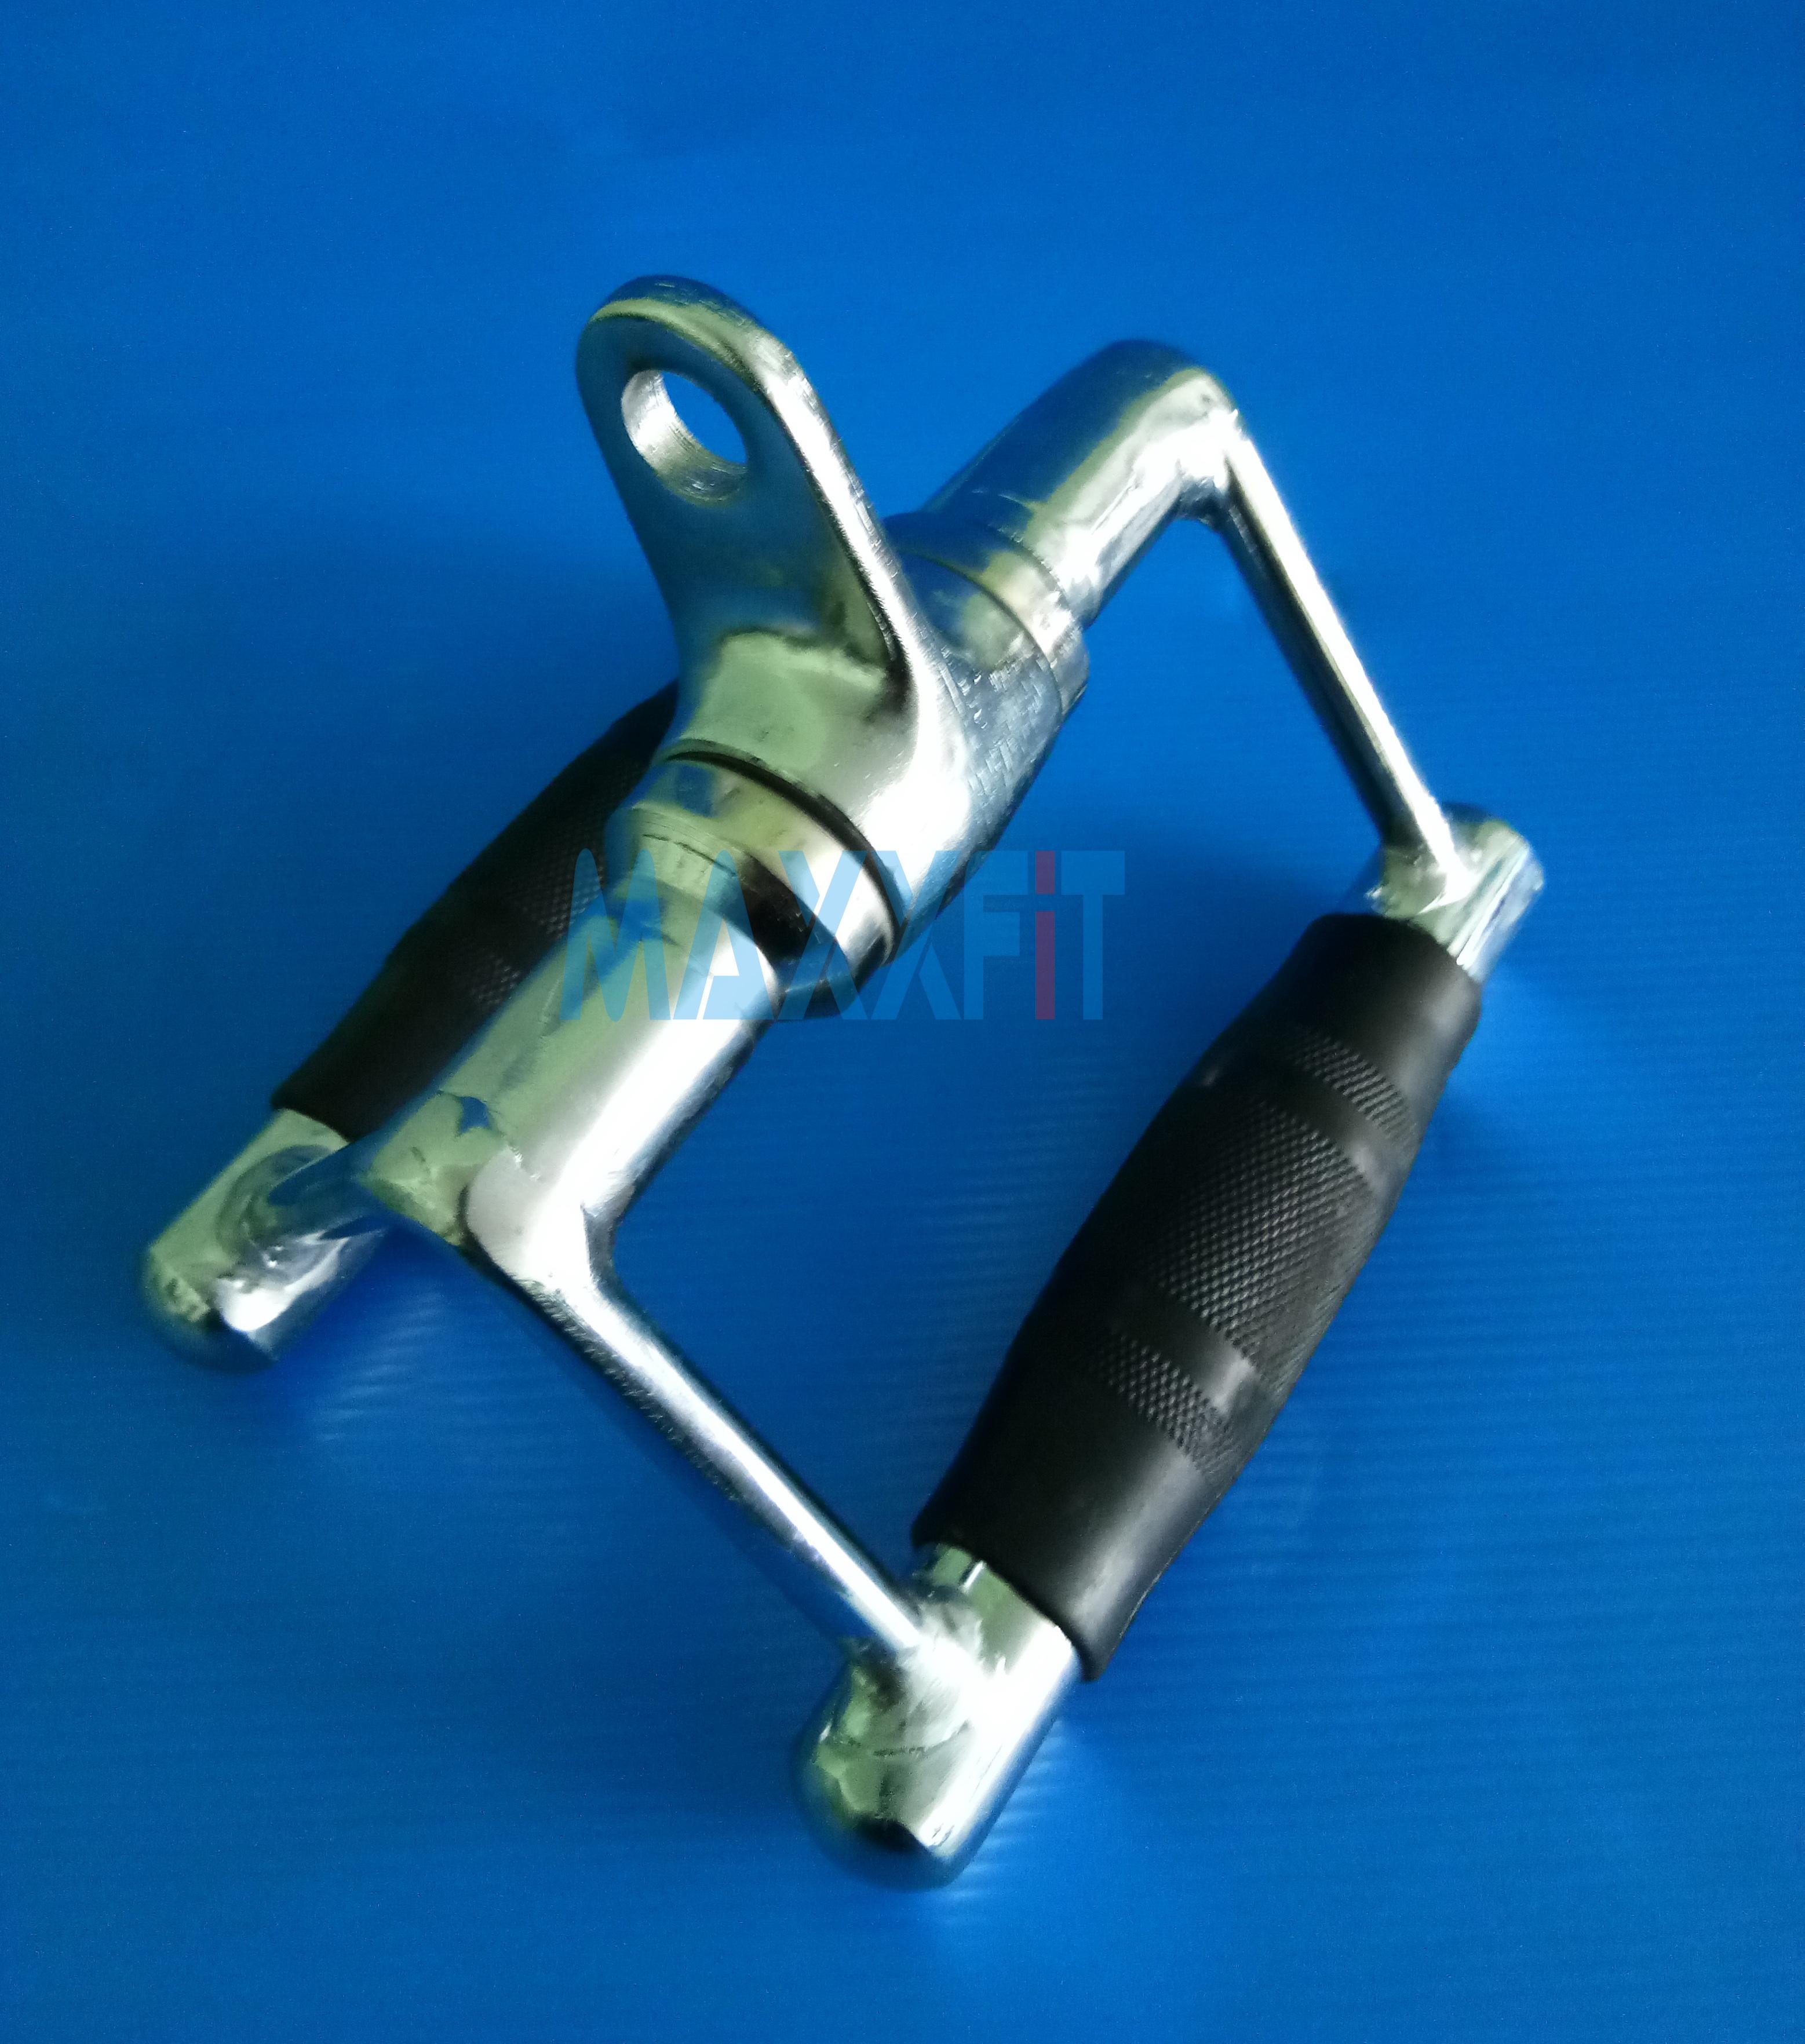 Revolving V- Grip แบบมือจับหุ้มยาง